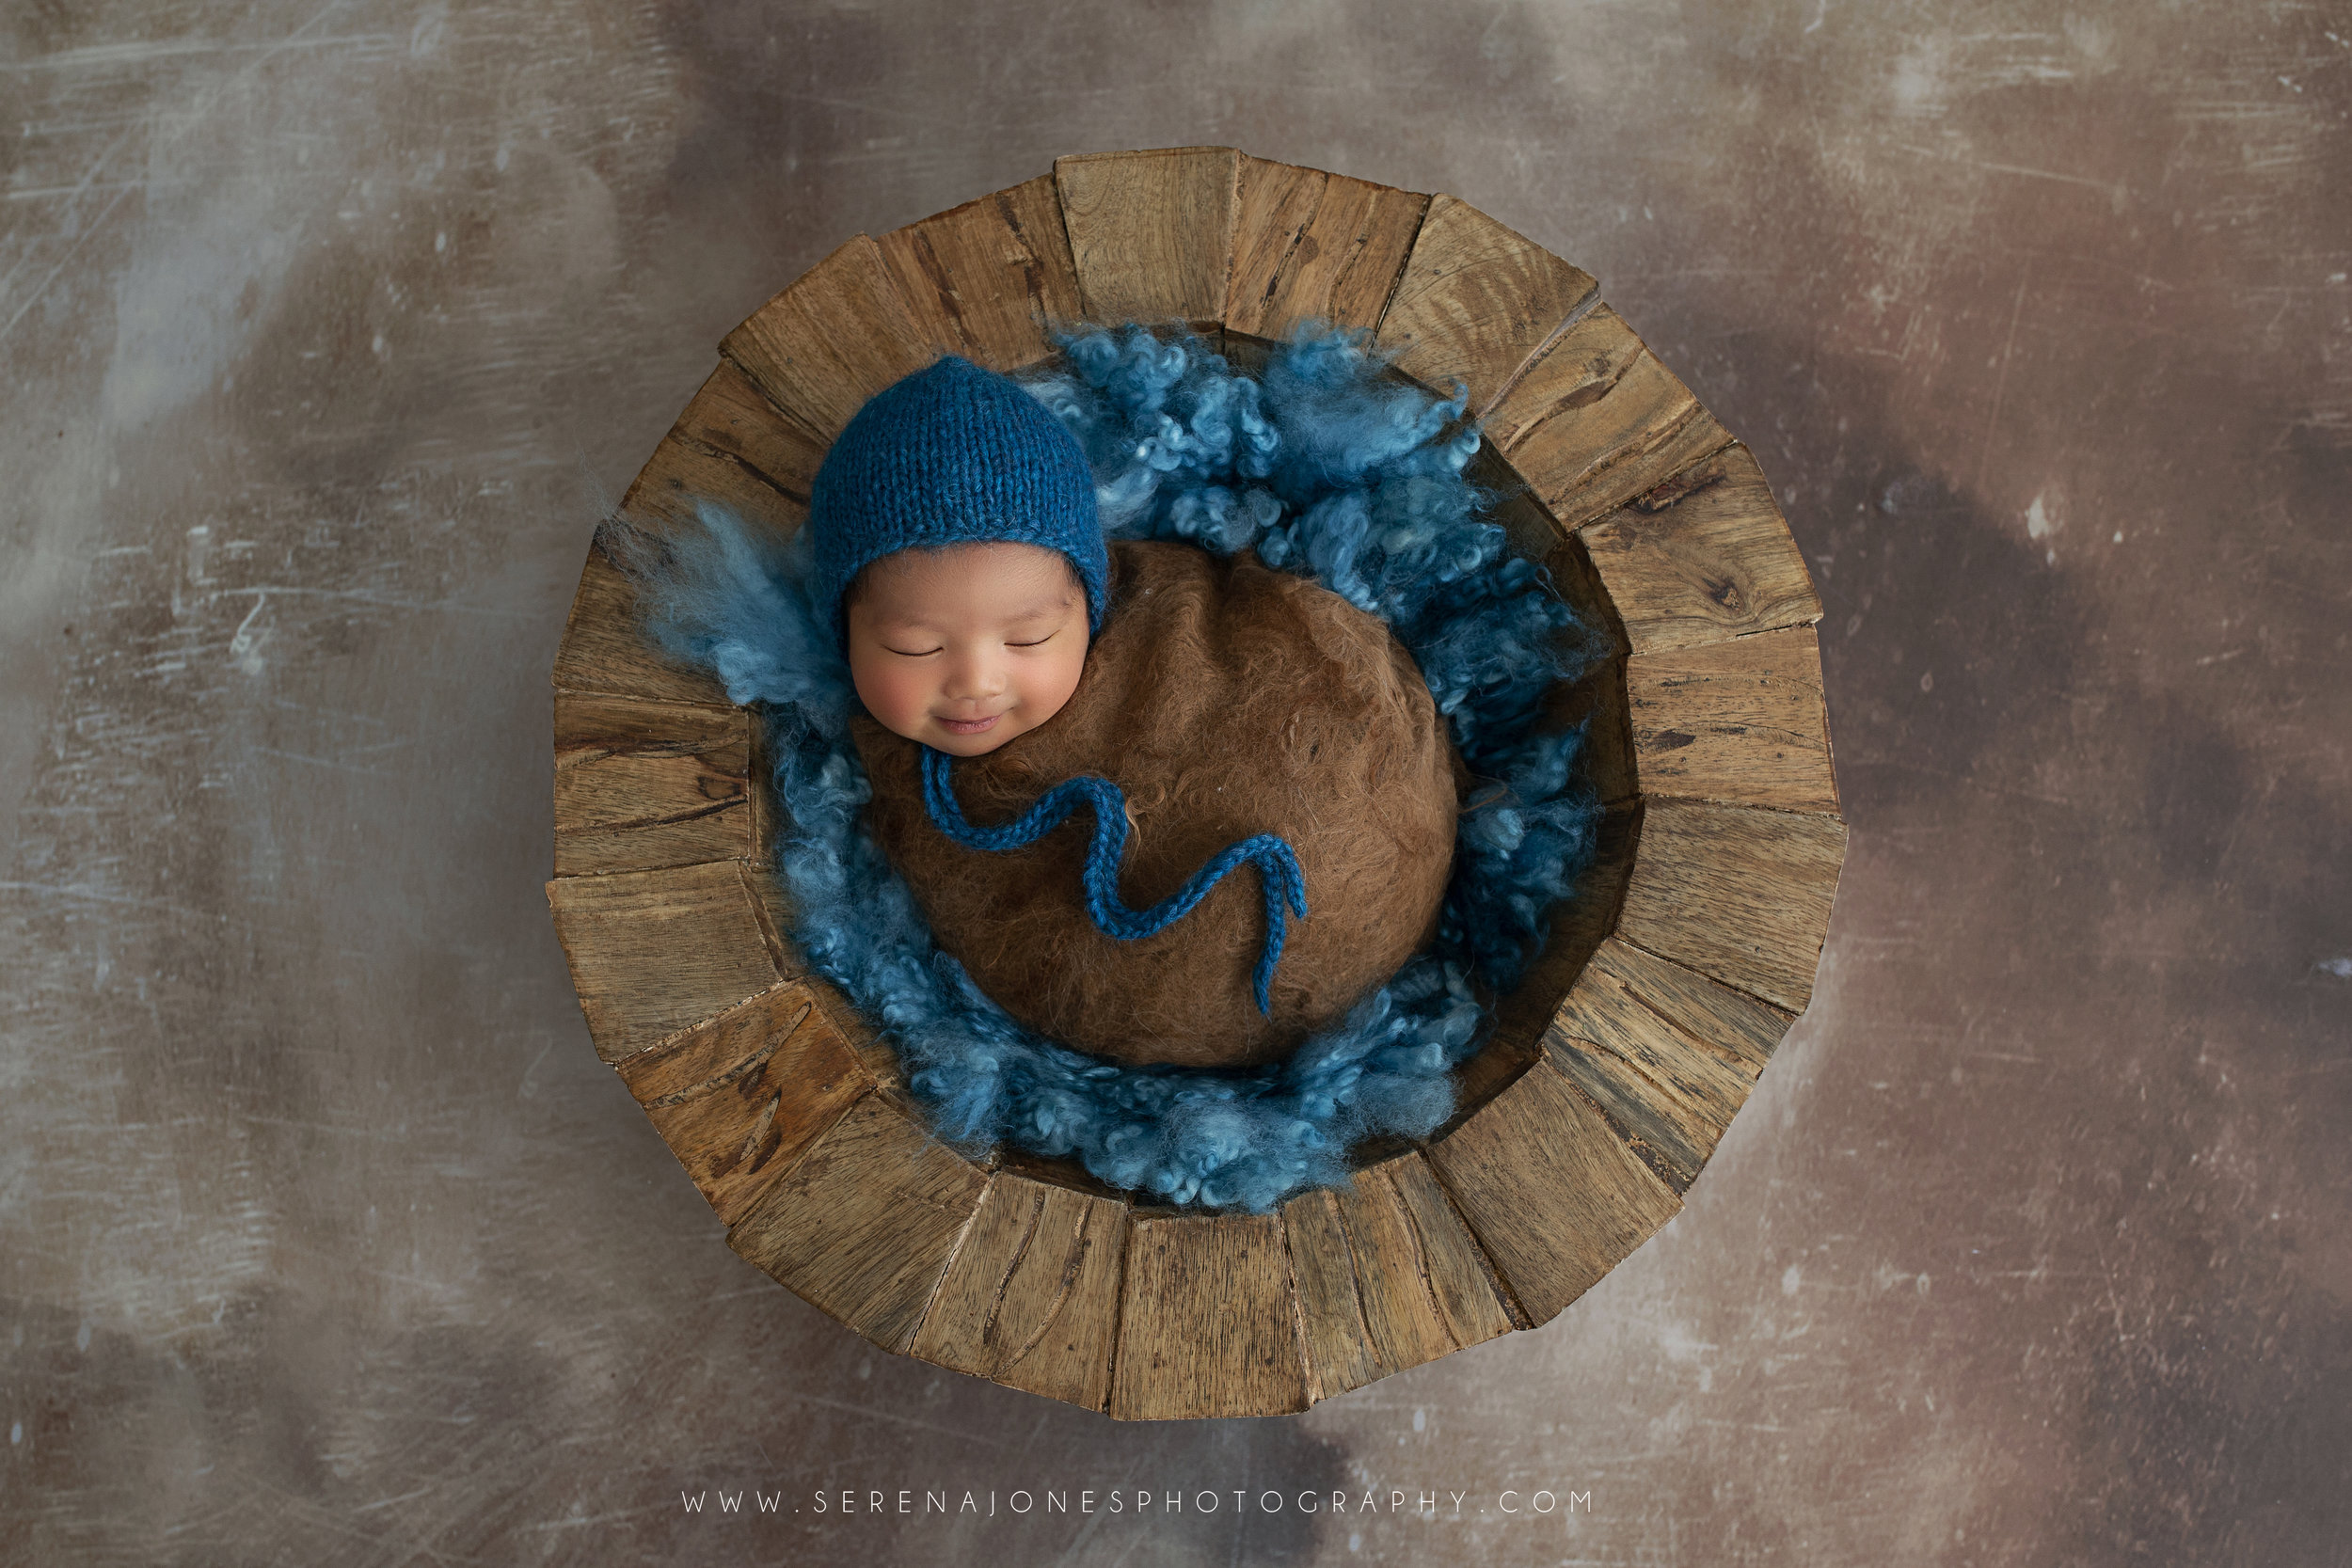 Serena Jones Photography - Tobias Akira Mateo - 8 FB.jpg